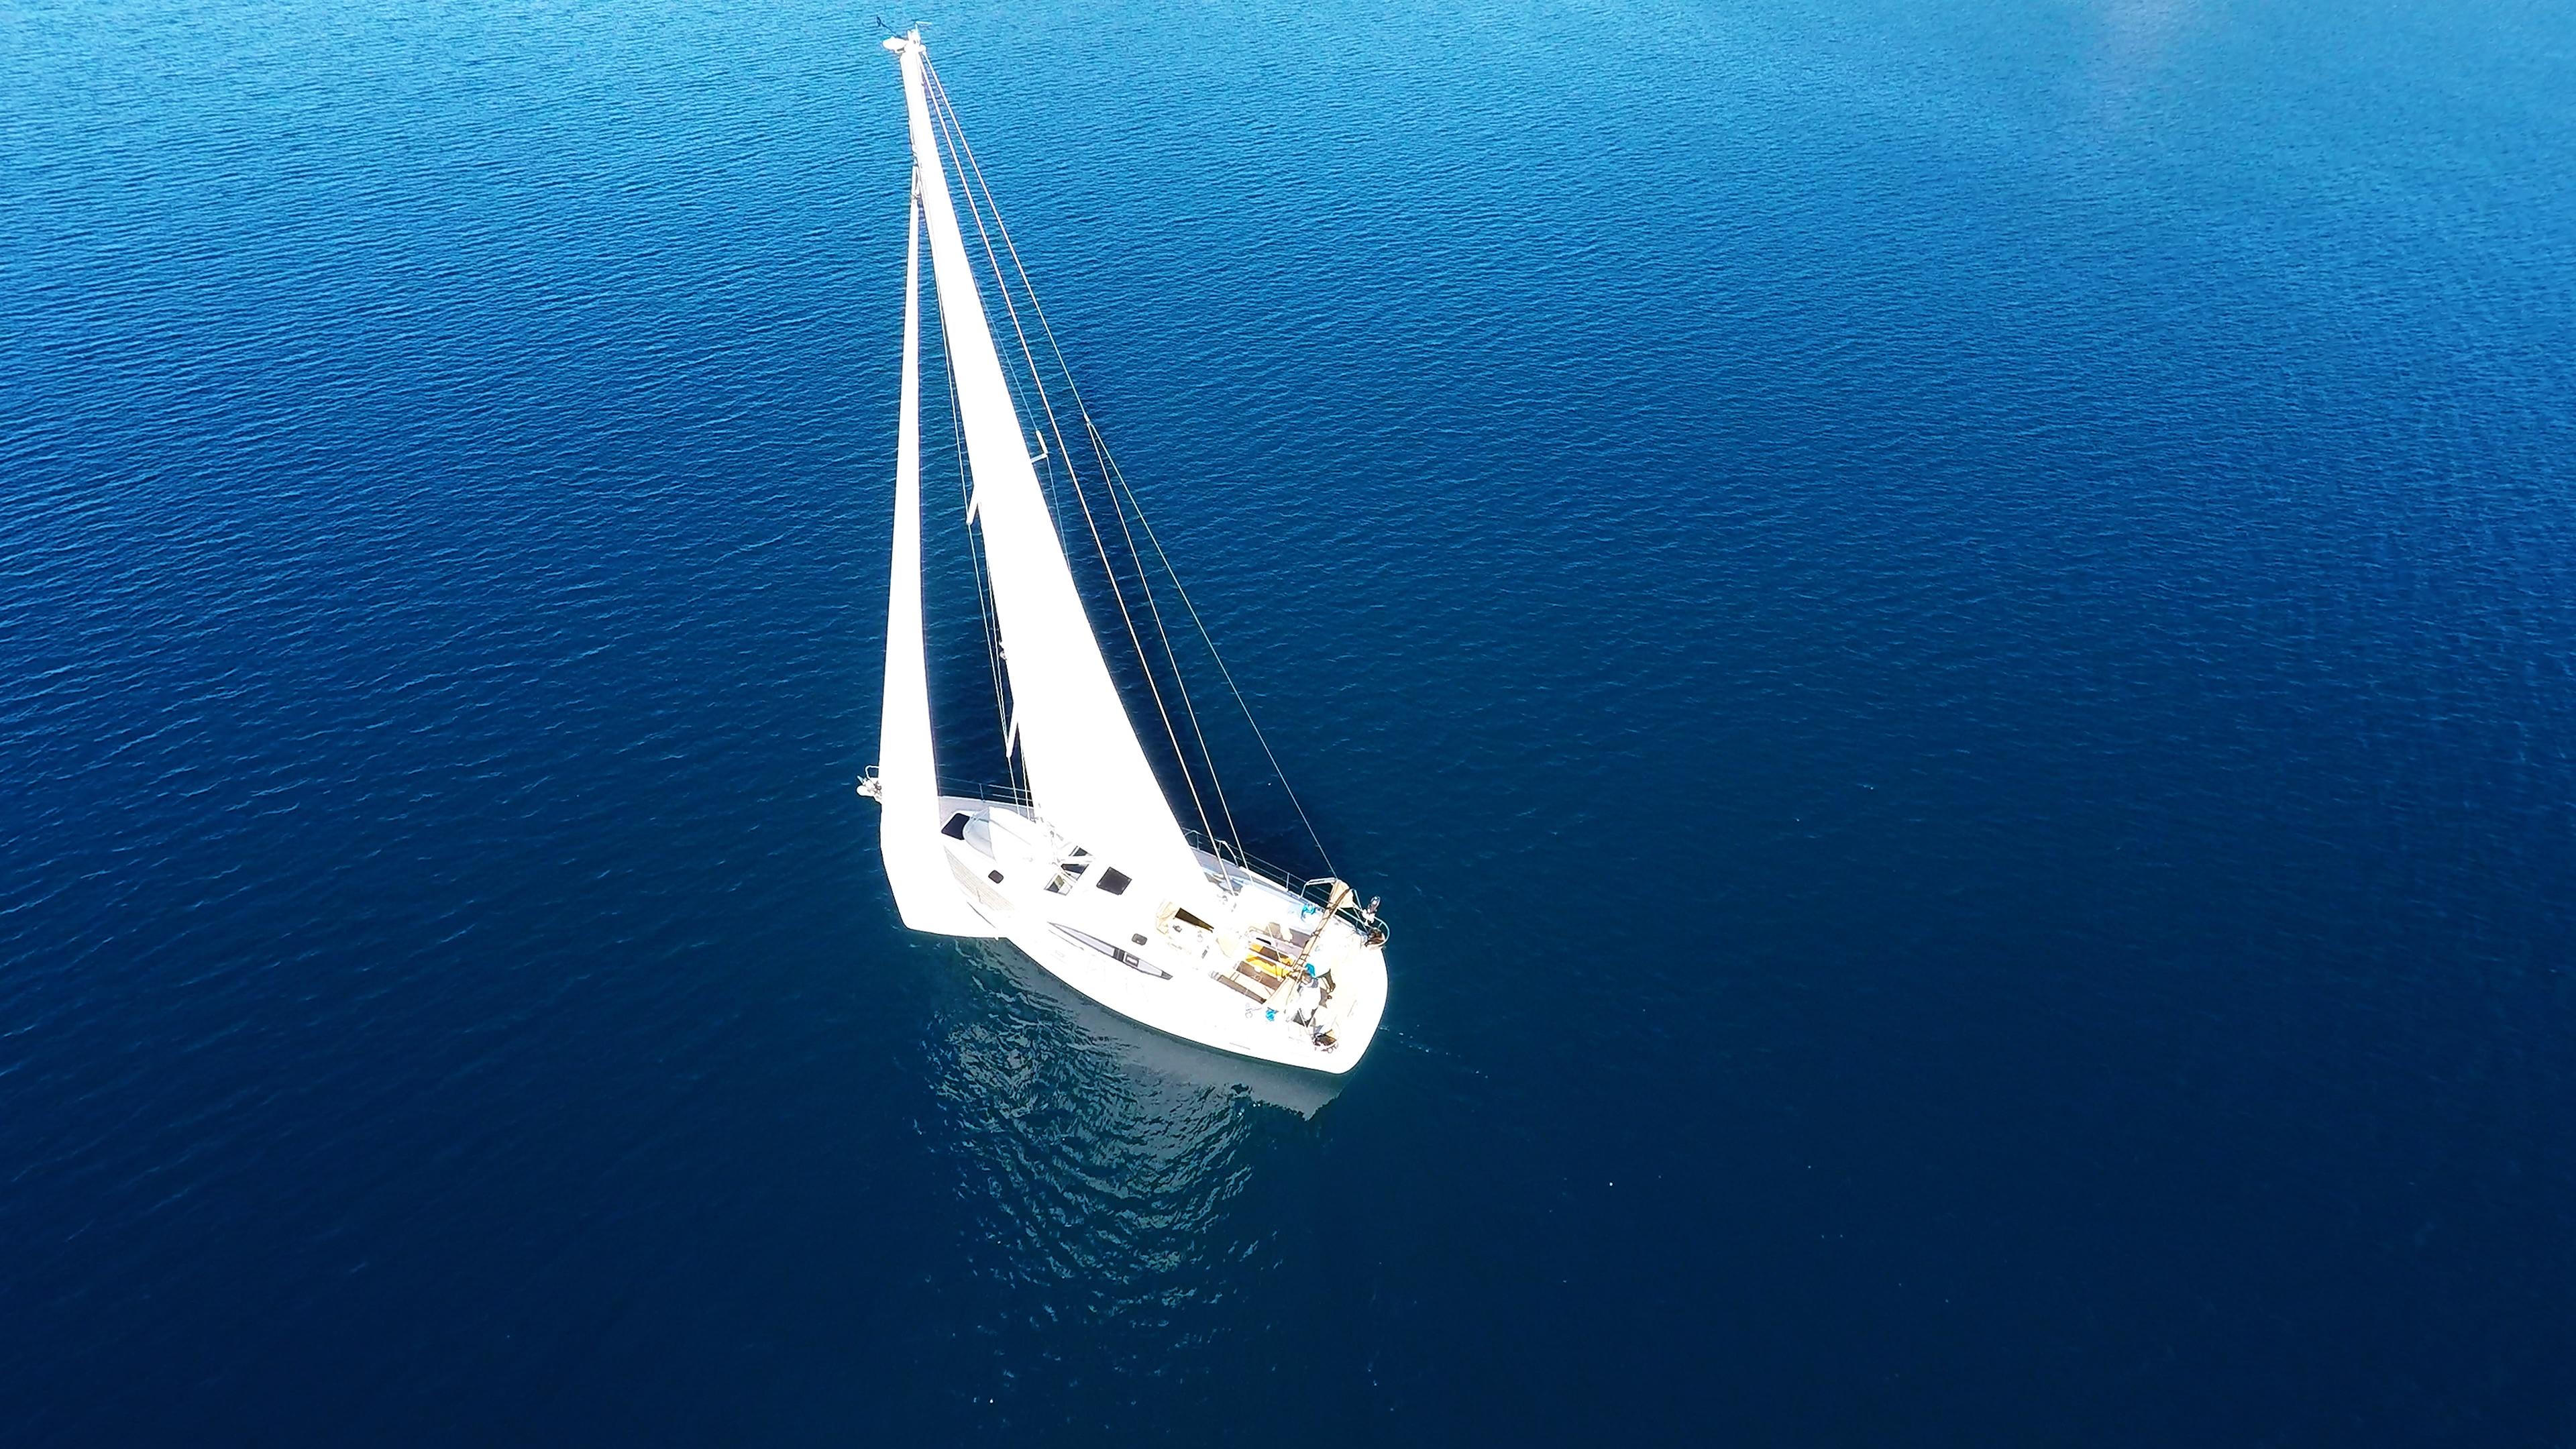 barcha a vela barca a vela veleggiare mare blu yacht barca soleggiato